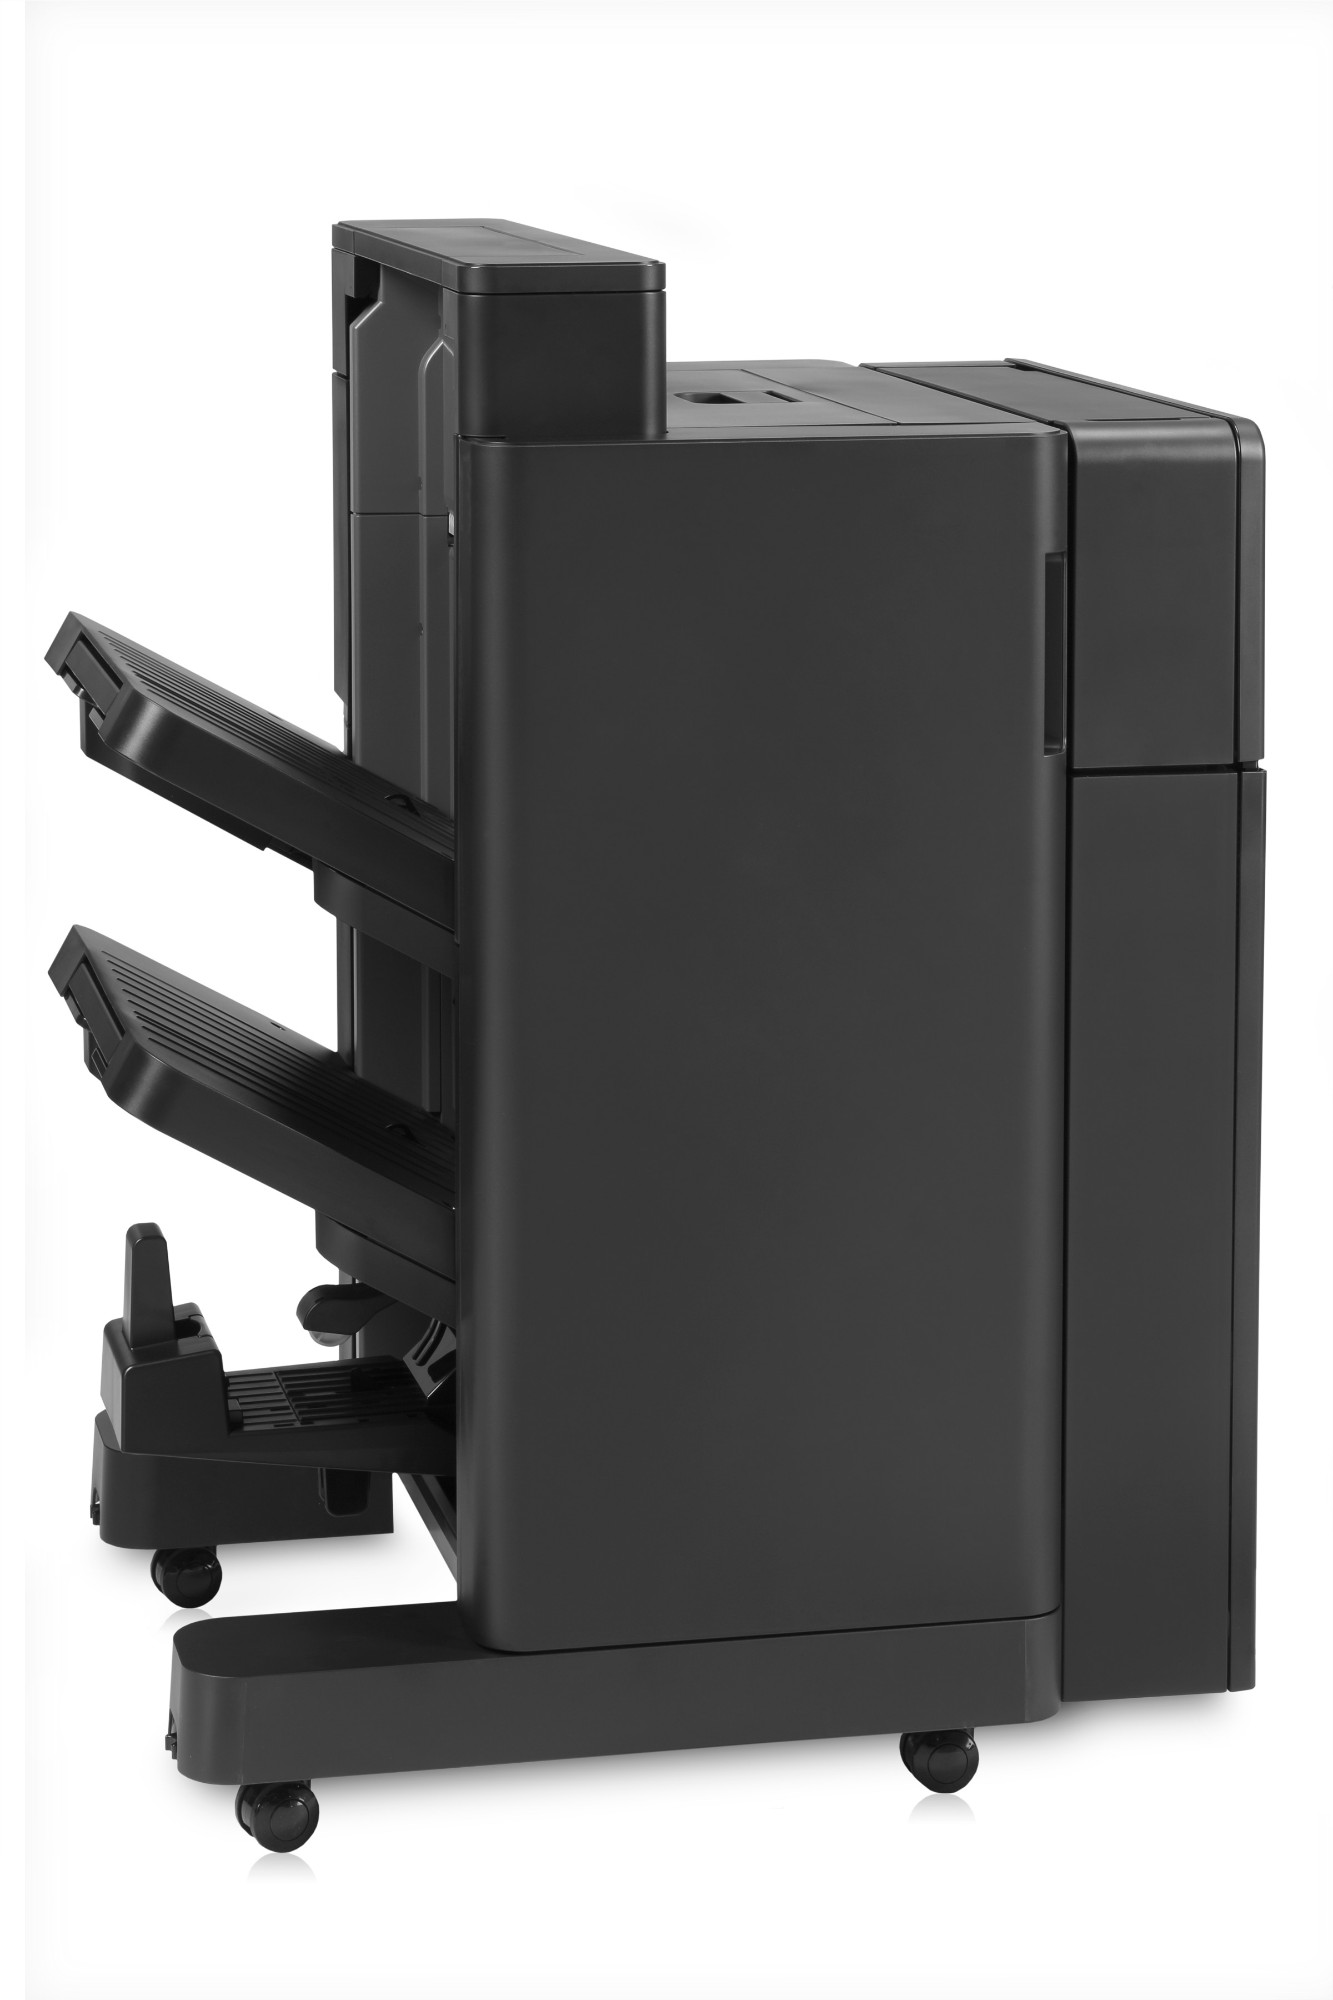 HP Color LaserJet Booklet Maker/Finisher with 2/4 hole punch